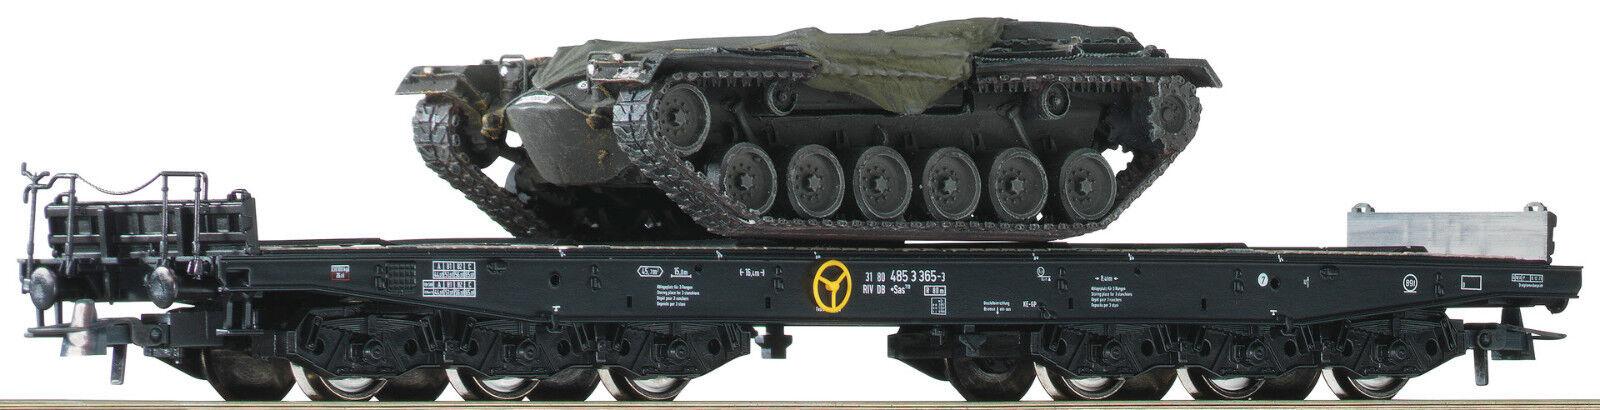 76161 - Roco 2 -styck set tunga, platta vagnar, DB, HO